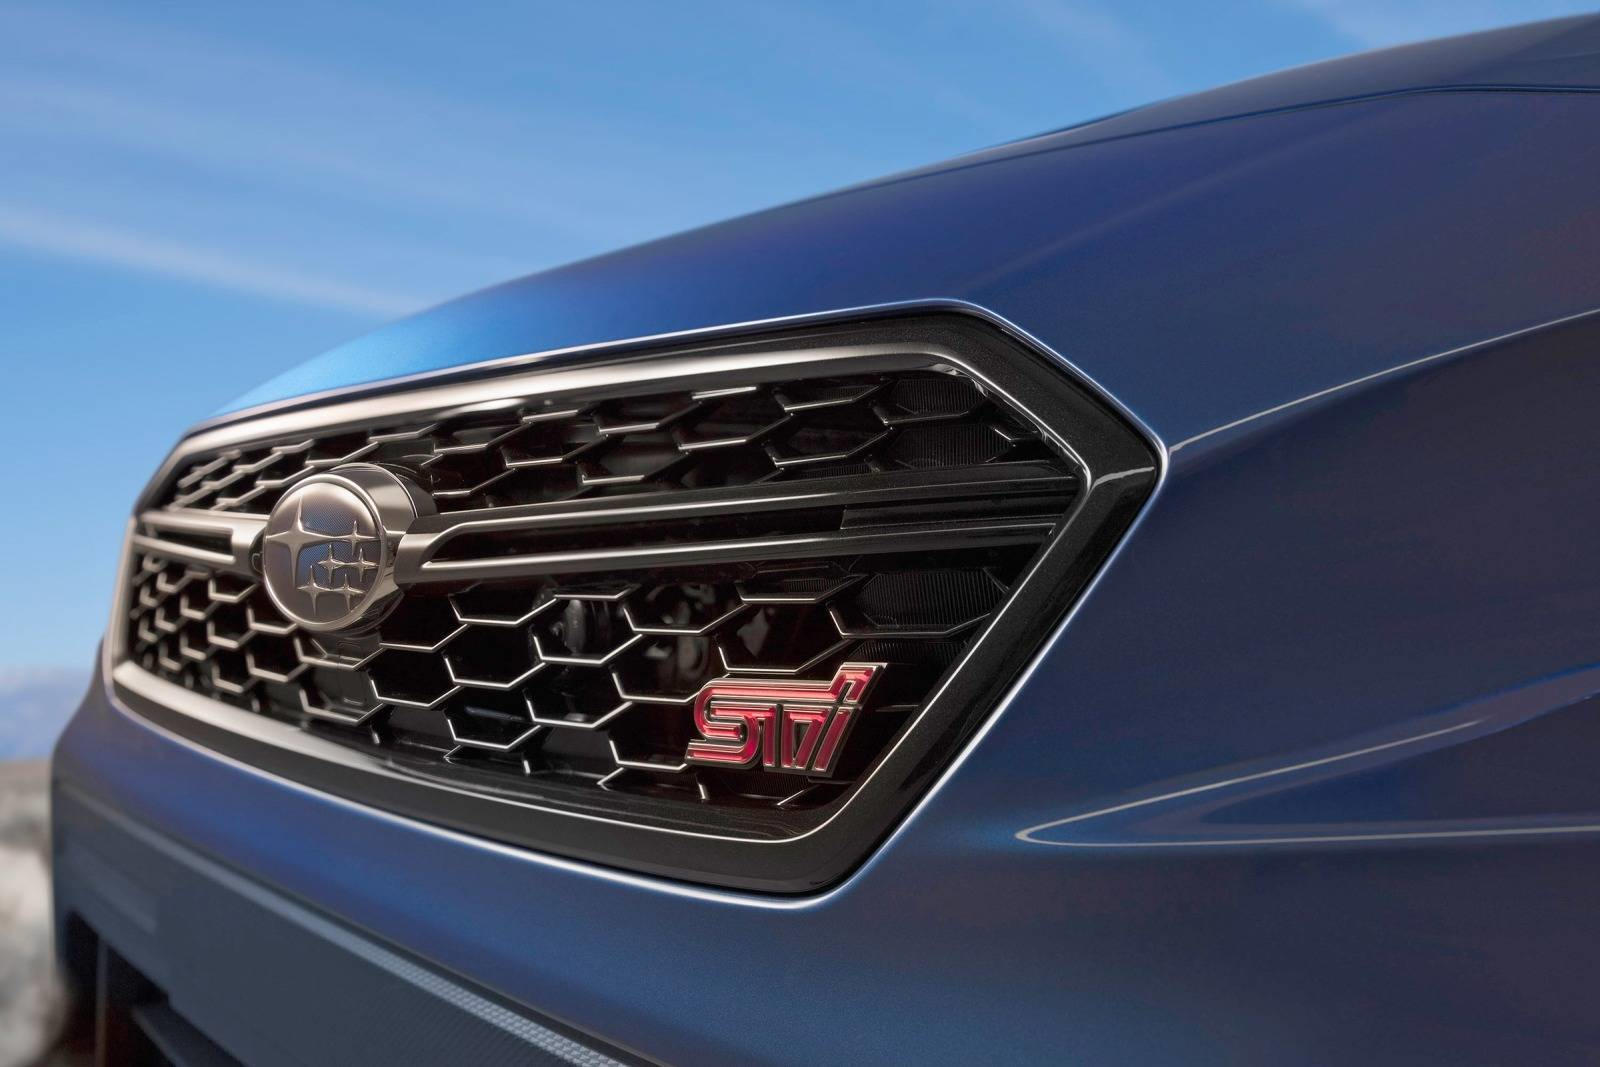 Subaru Could Have A BIG Next-Gen WRX Surprise